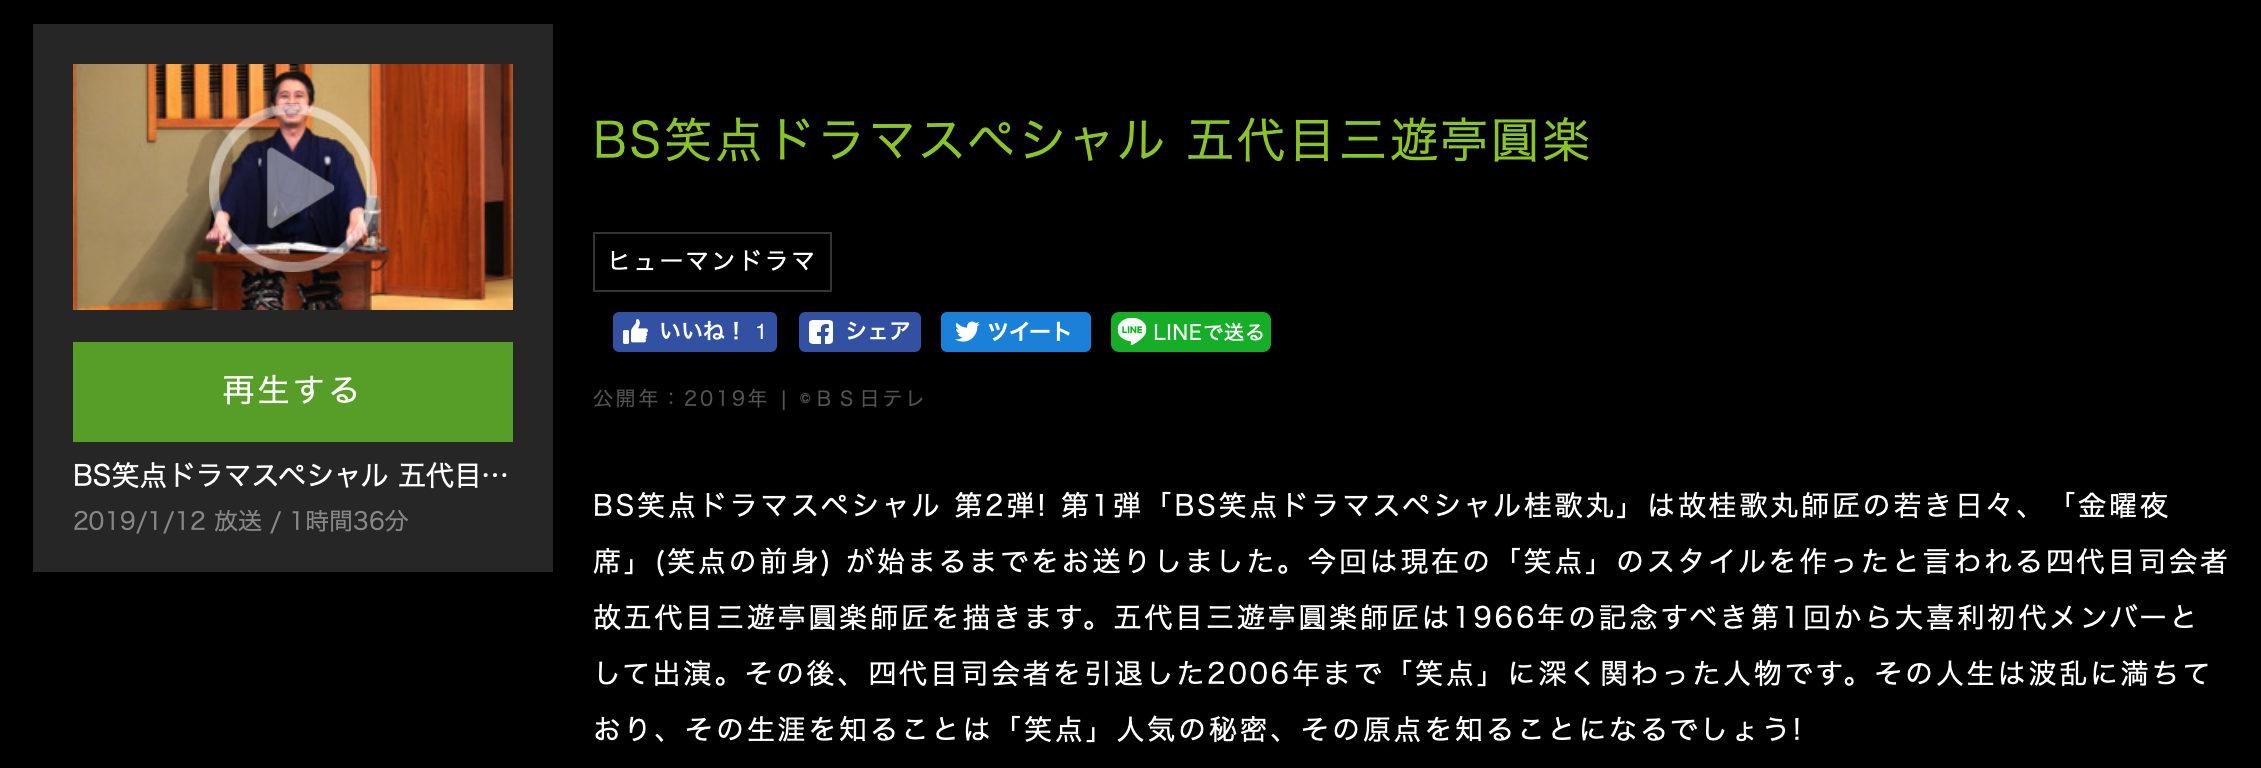 BS笑点ドラマスペシャル 五代目三遊亭圓楽あらすじ